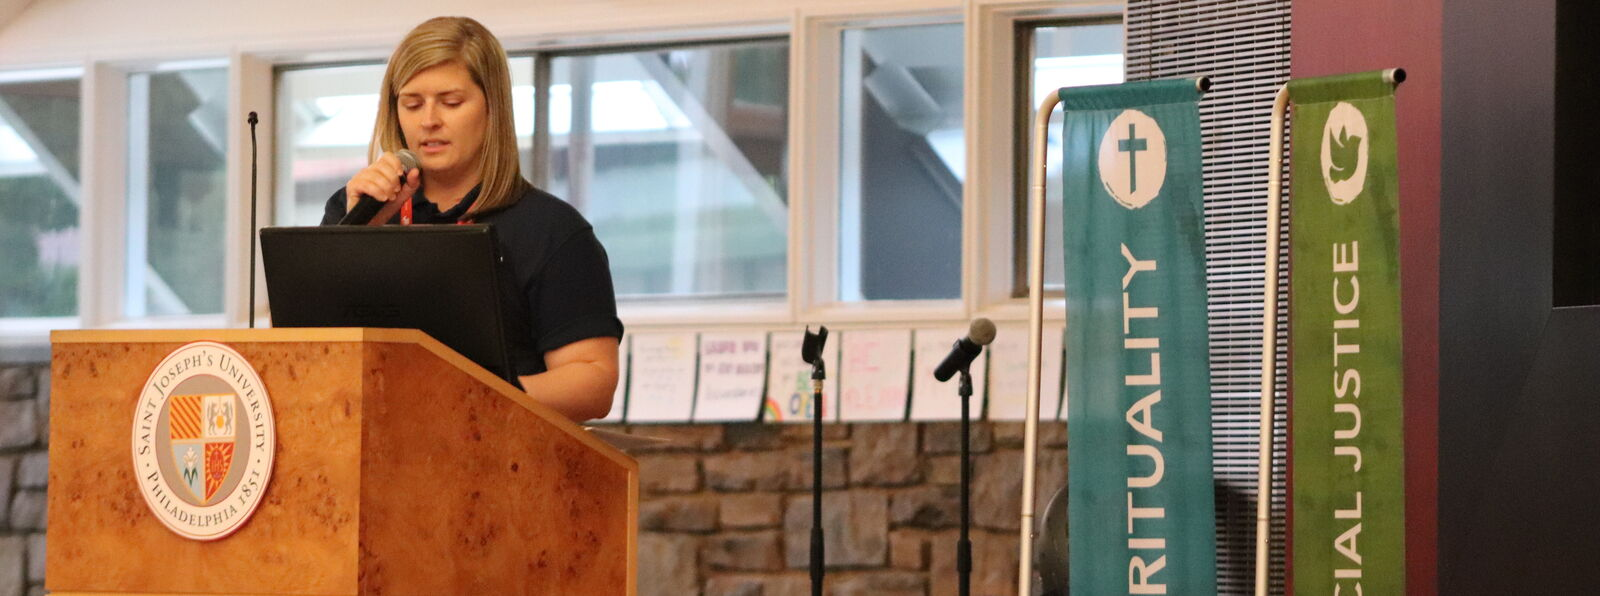 Director of Program Laura Strubeck Orientation 2019